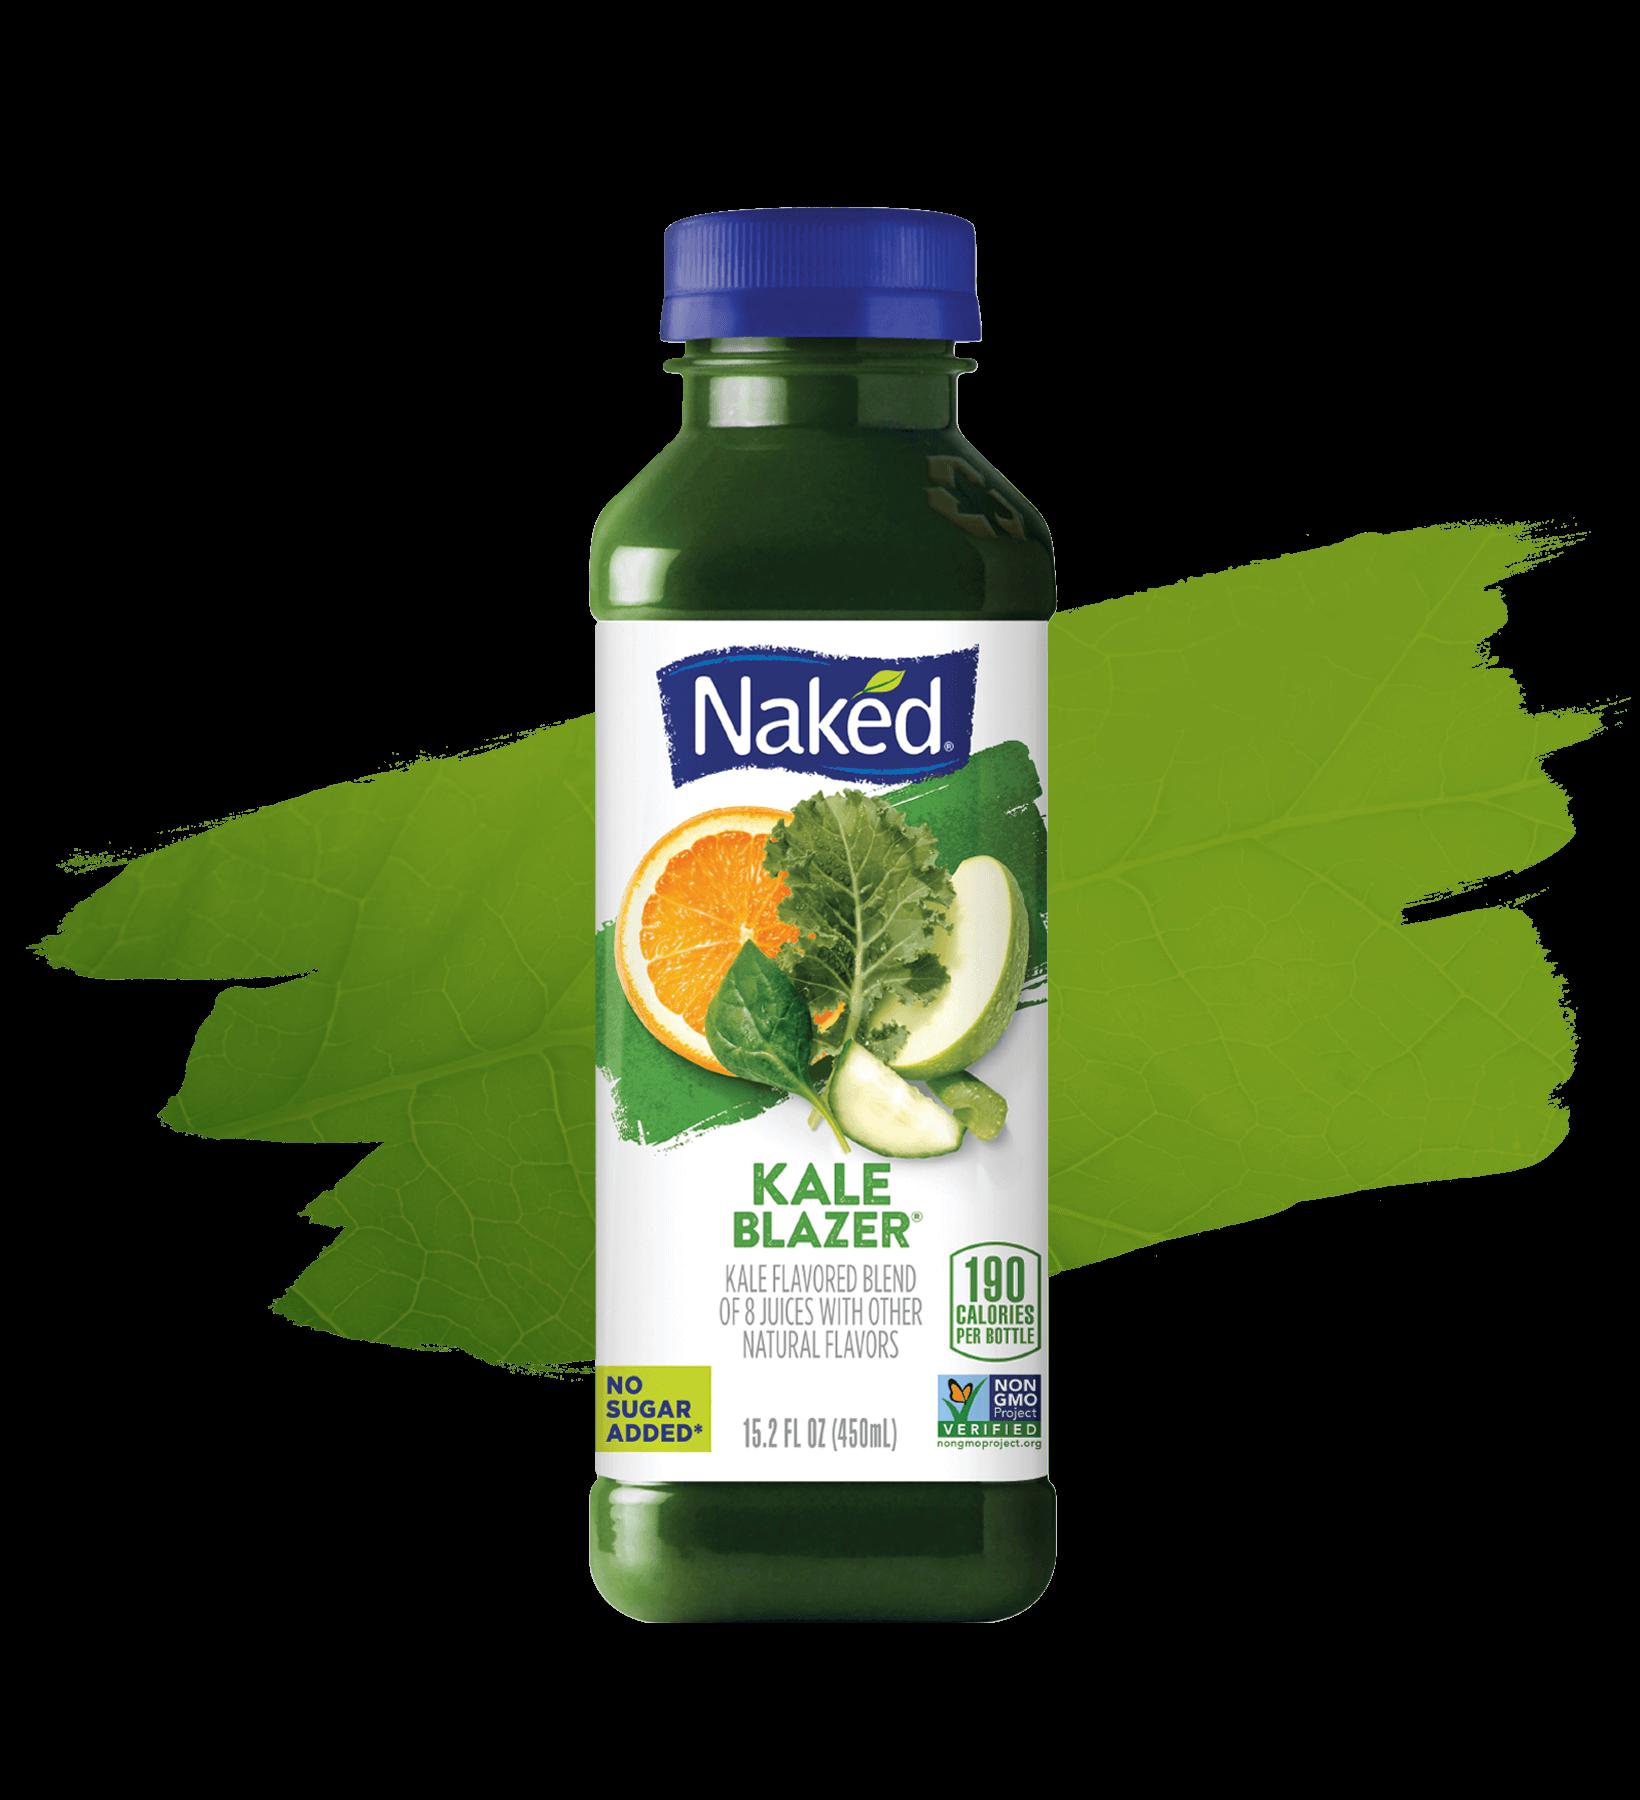 Naked : Kale Blazer